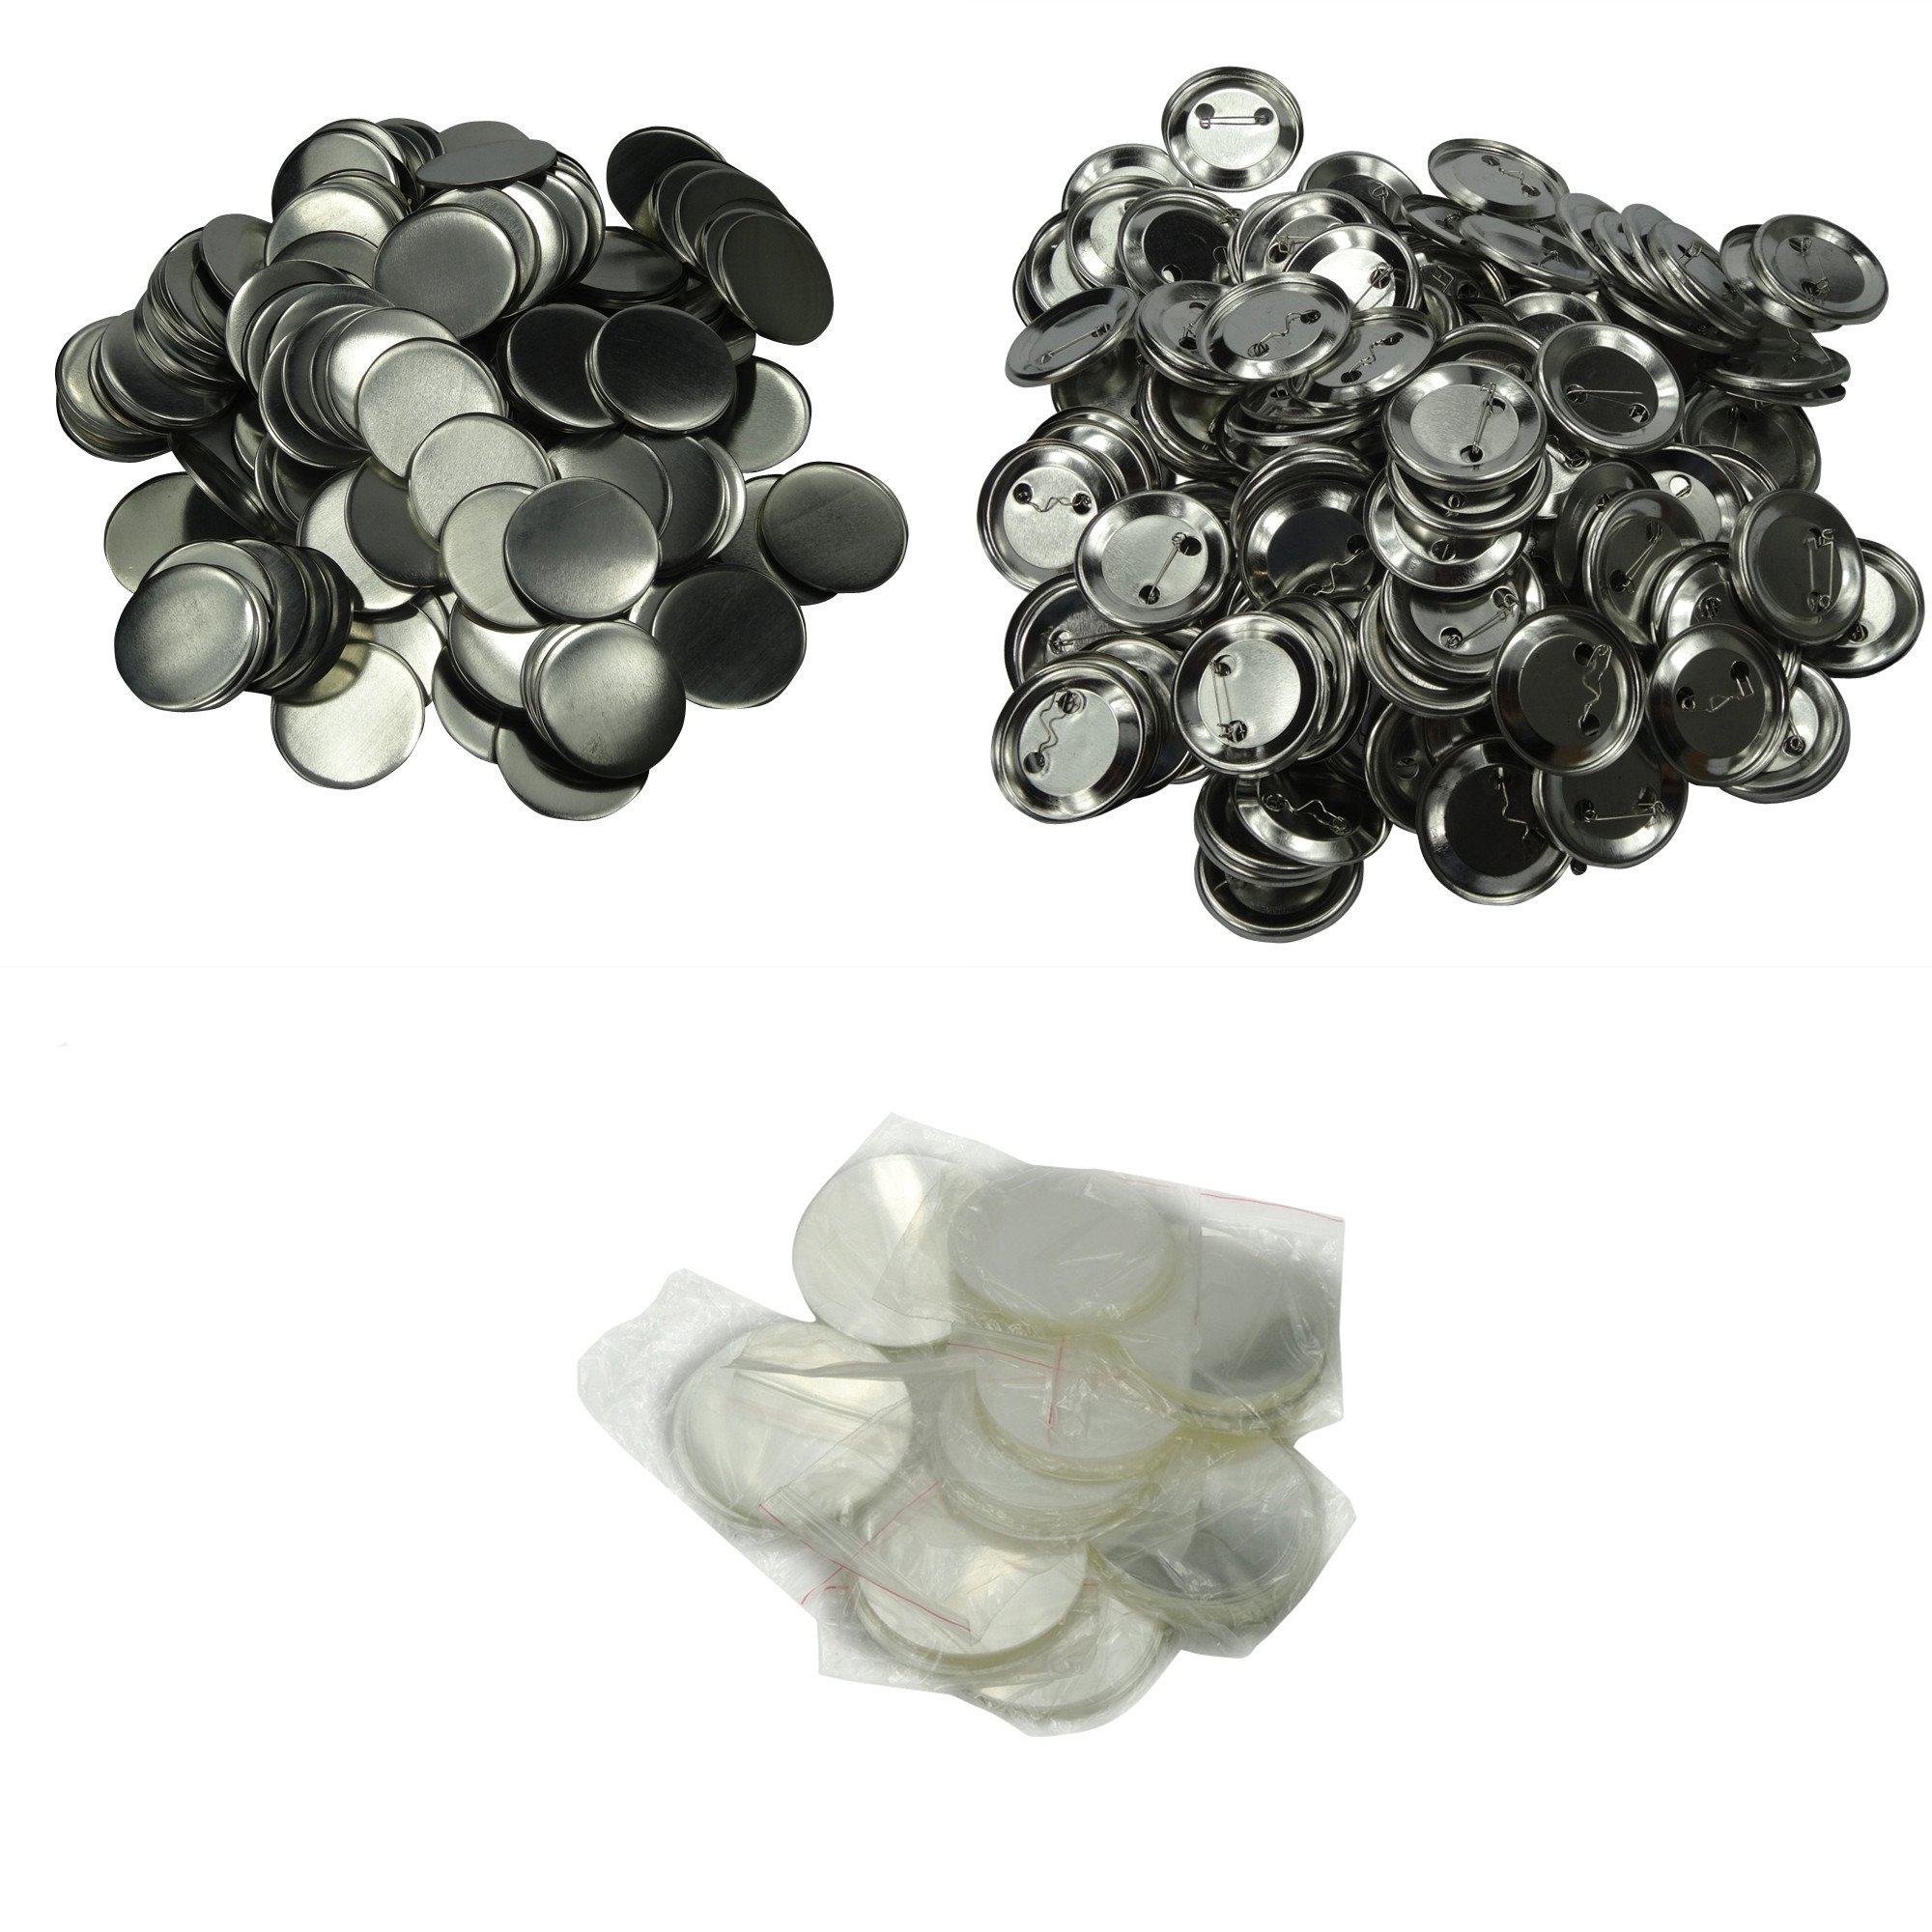 DAWEI 500Pcs 1'' 25mm Blank Badge & Button Parts for Badge Maker Machine by DAWEI